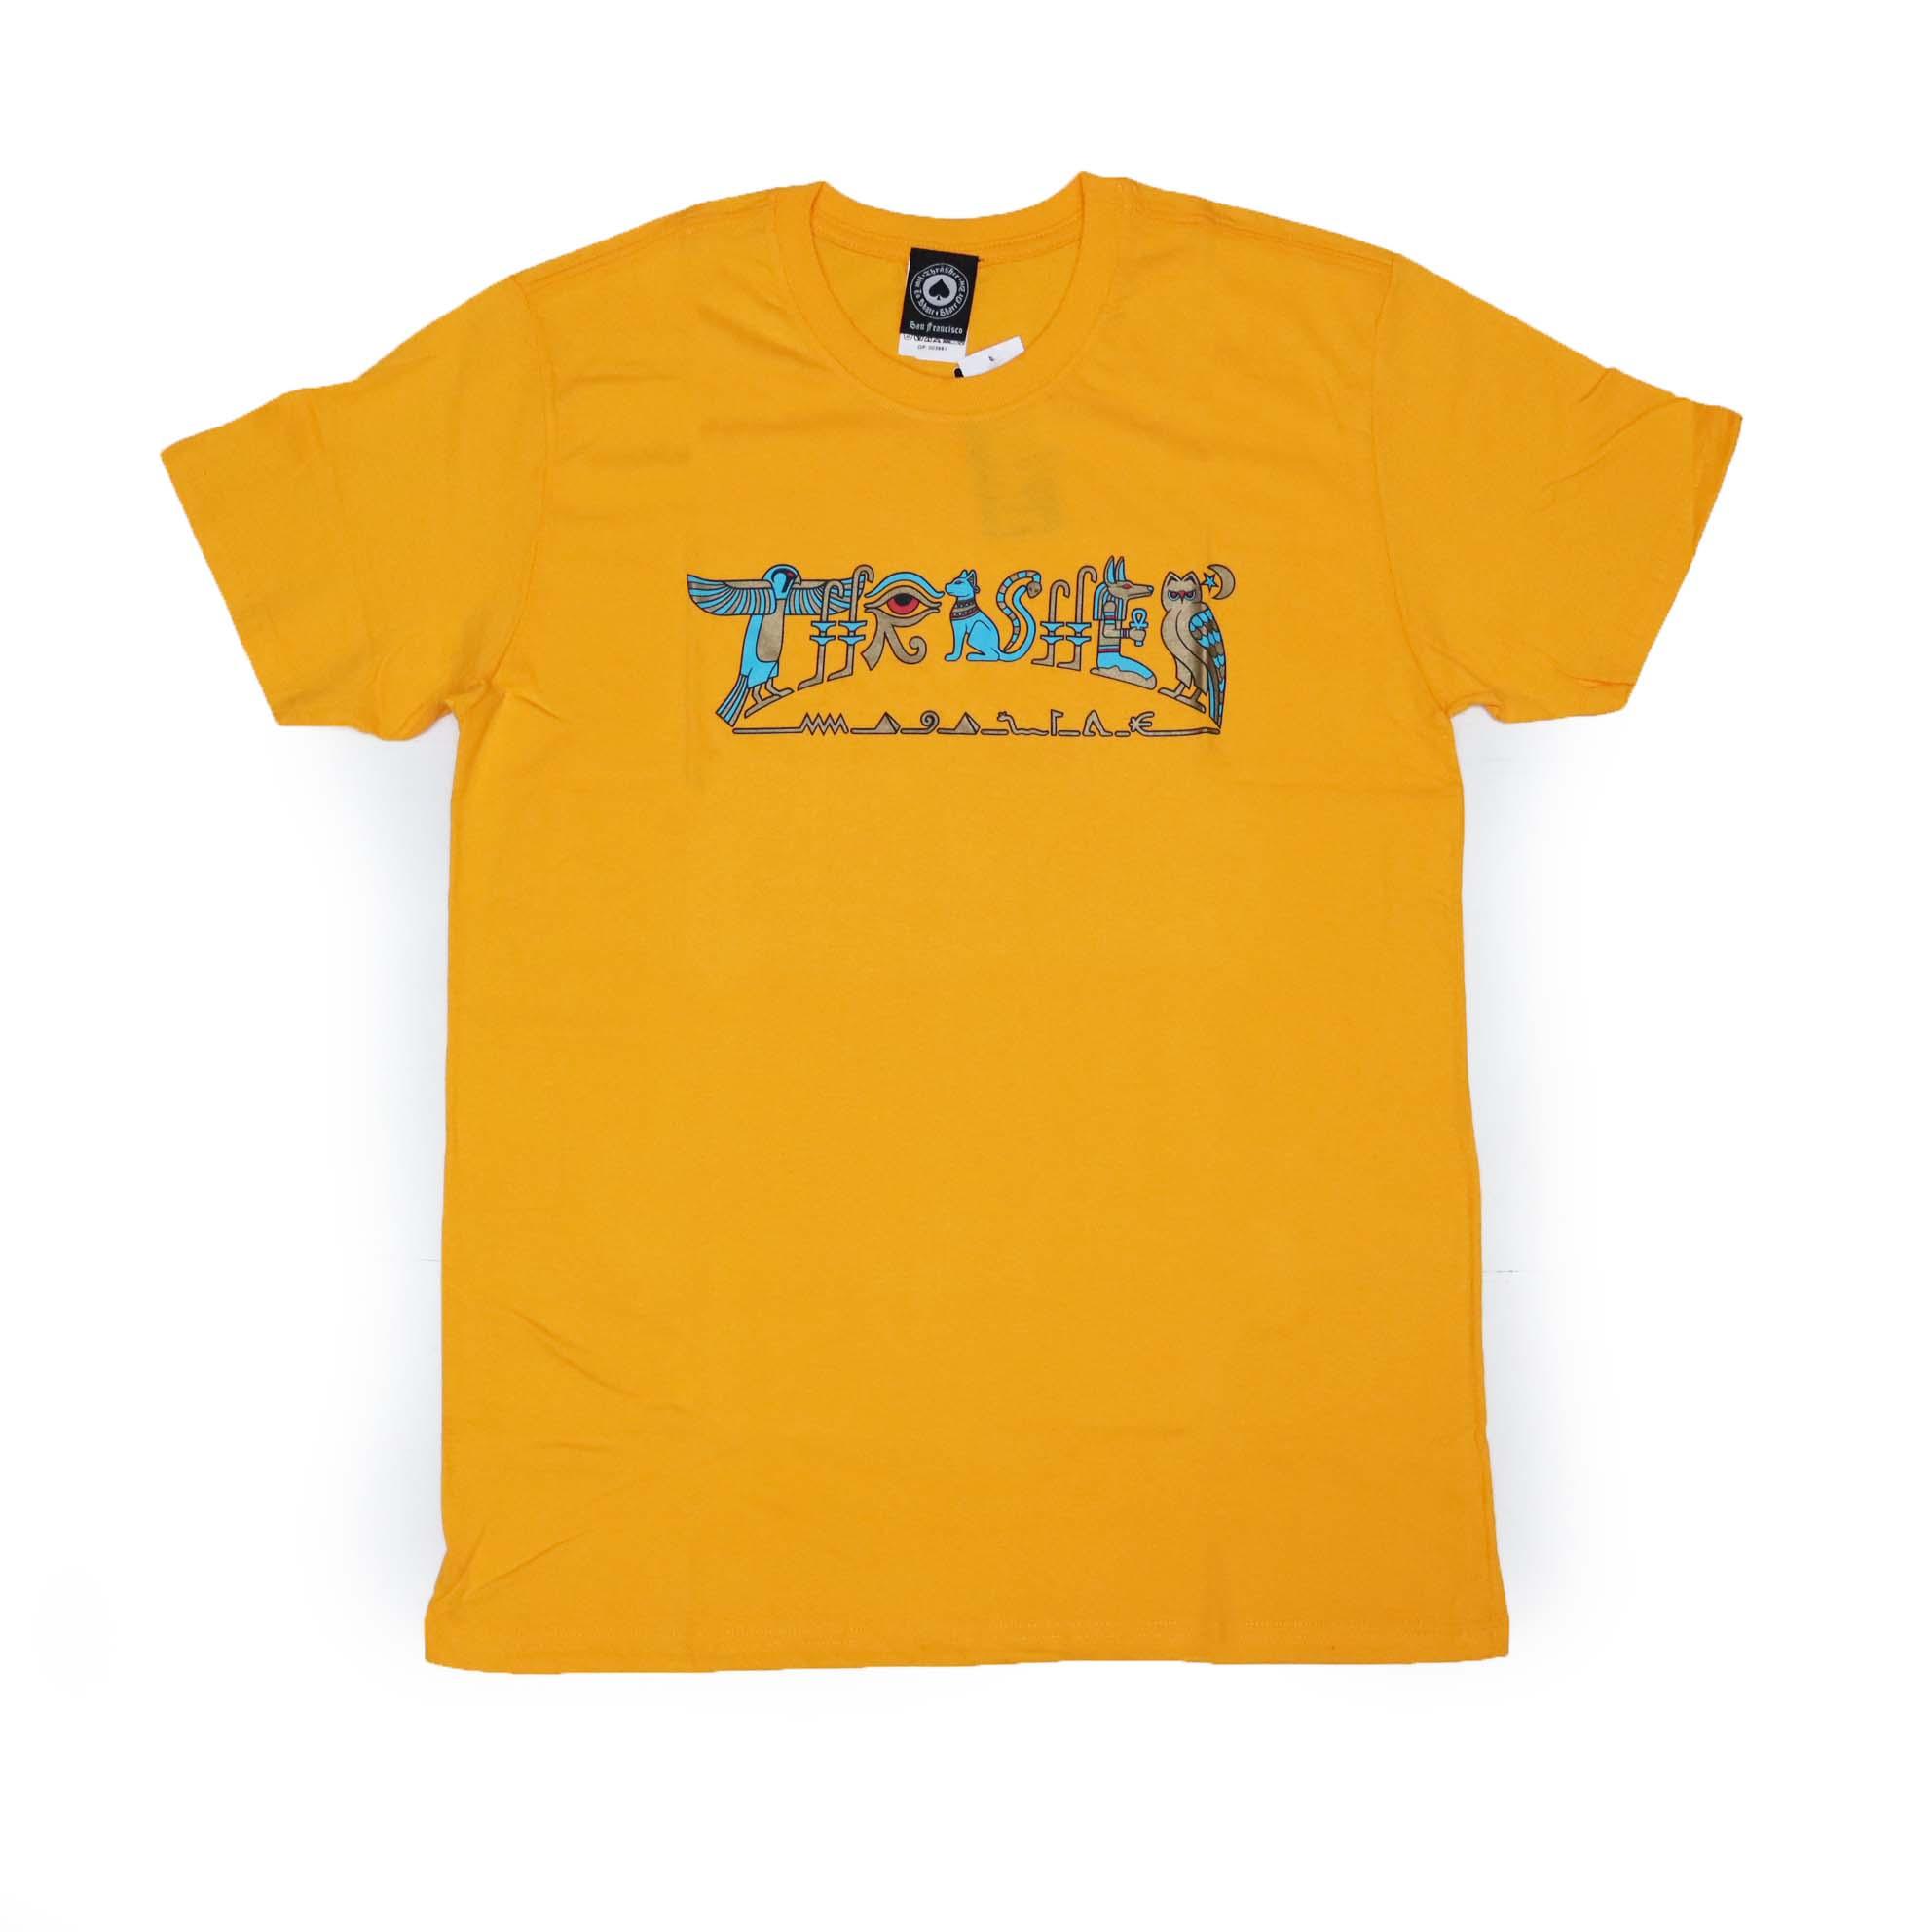 Camiseta Thrasher Magazine Hieroglyphics - Amarelo